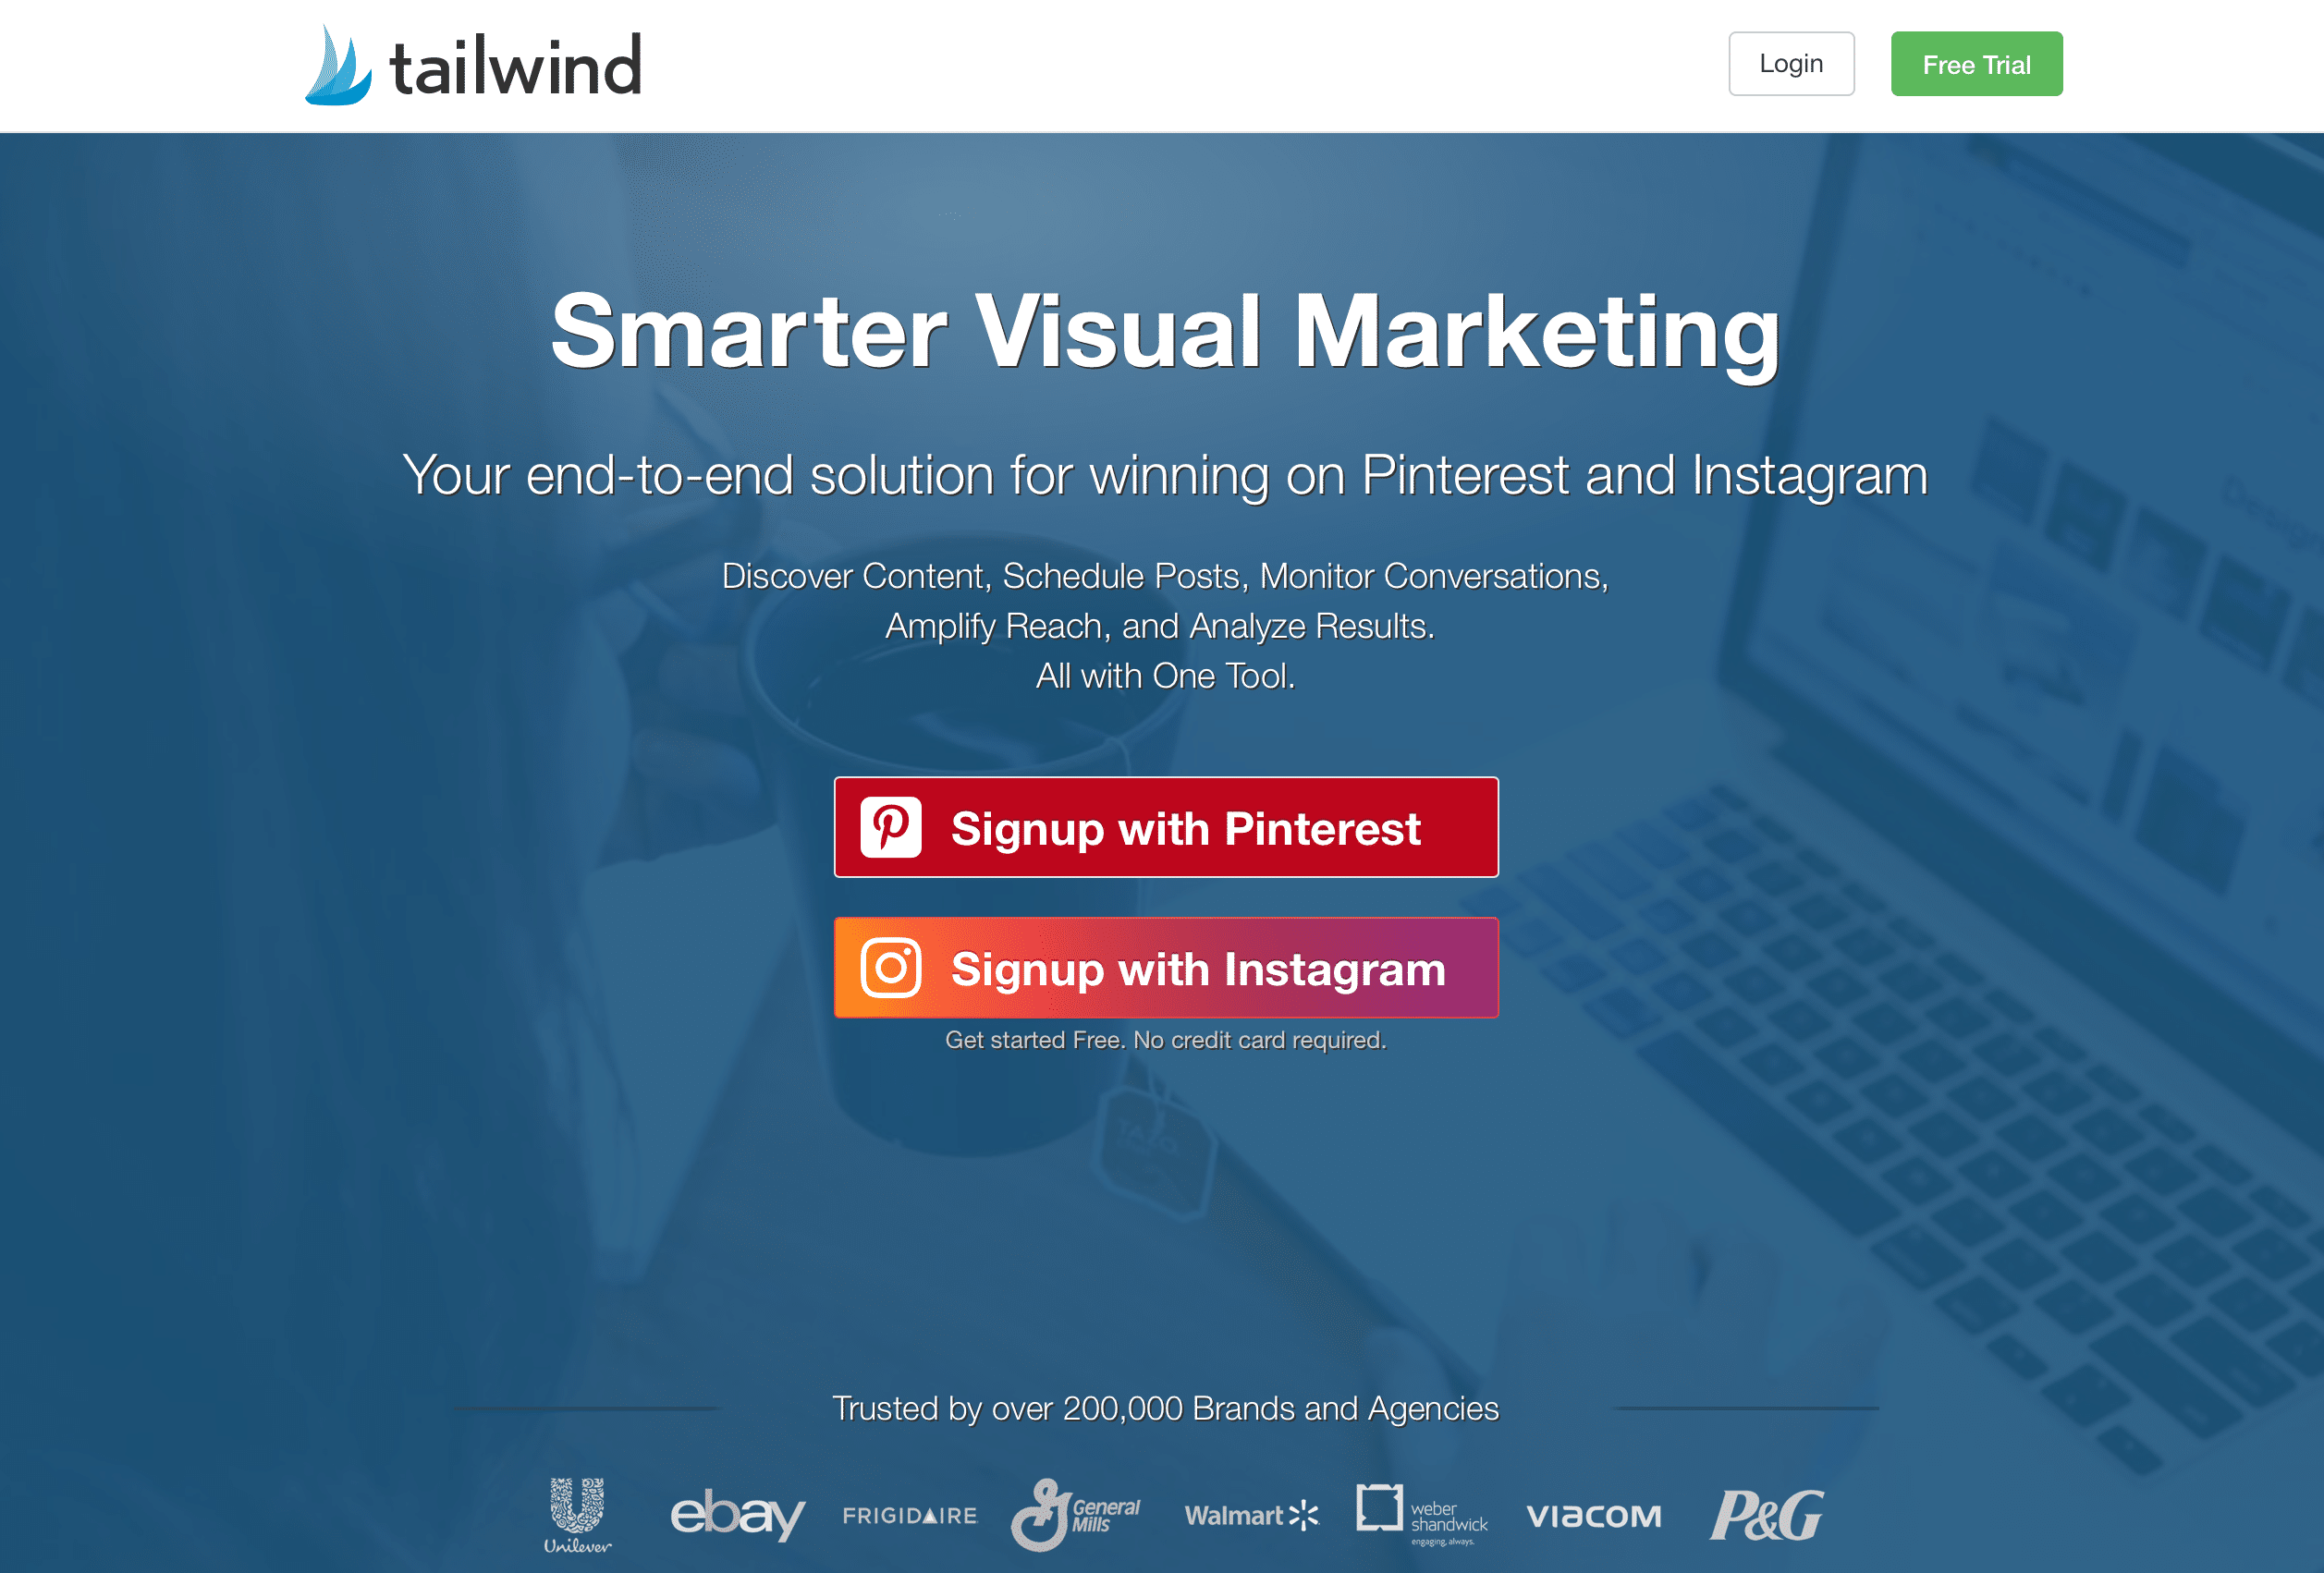 Smart Visual Marketing